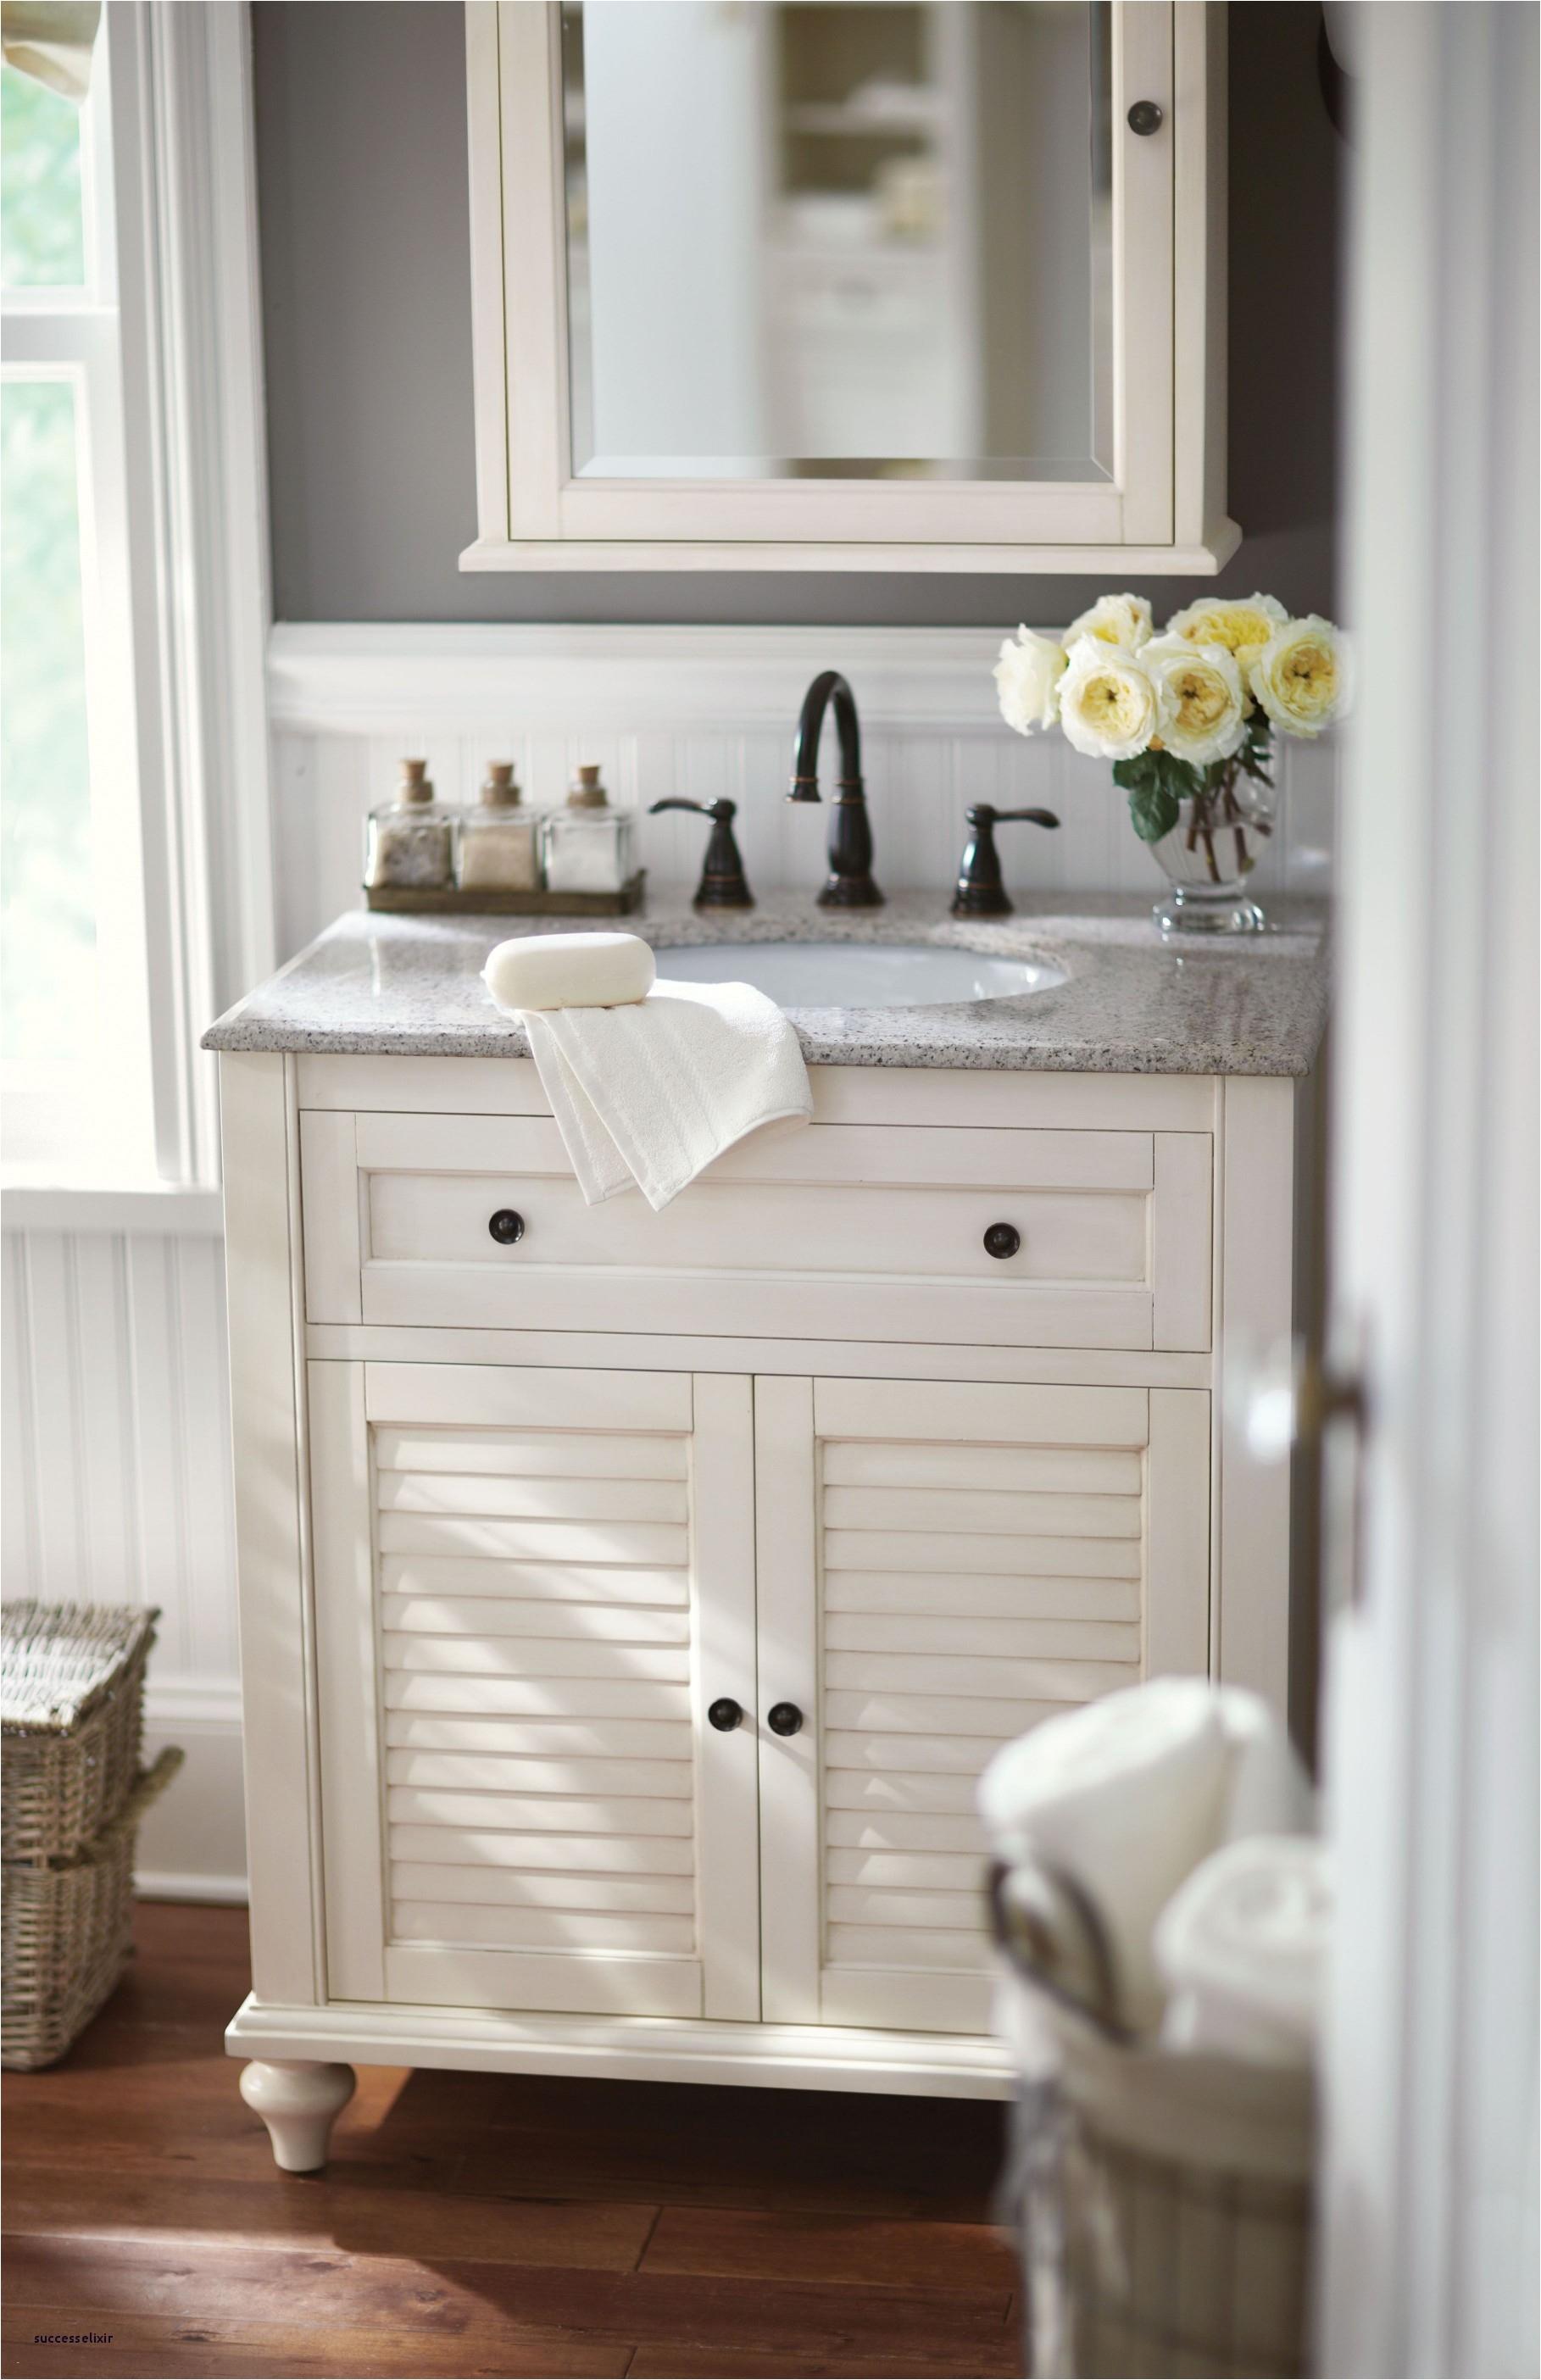 dark vanity unique small kitchen sink vanity fresh bathroom sink cabinets beautiful 0d collection